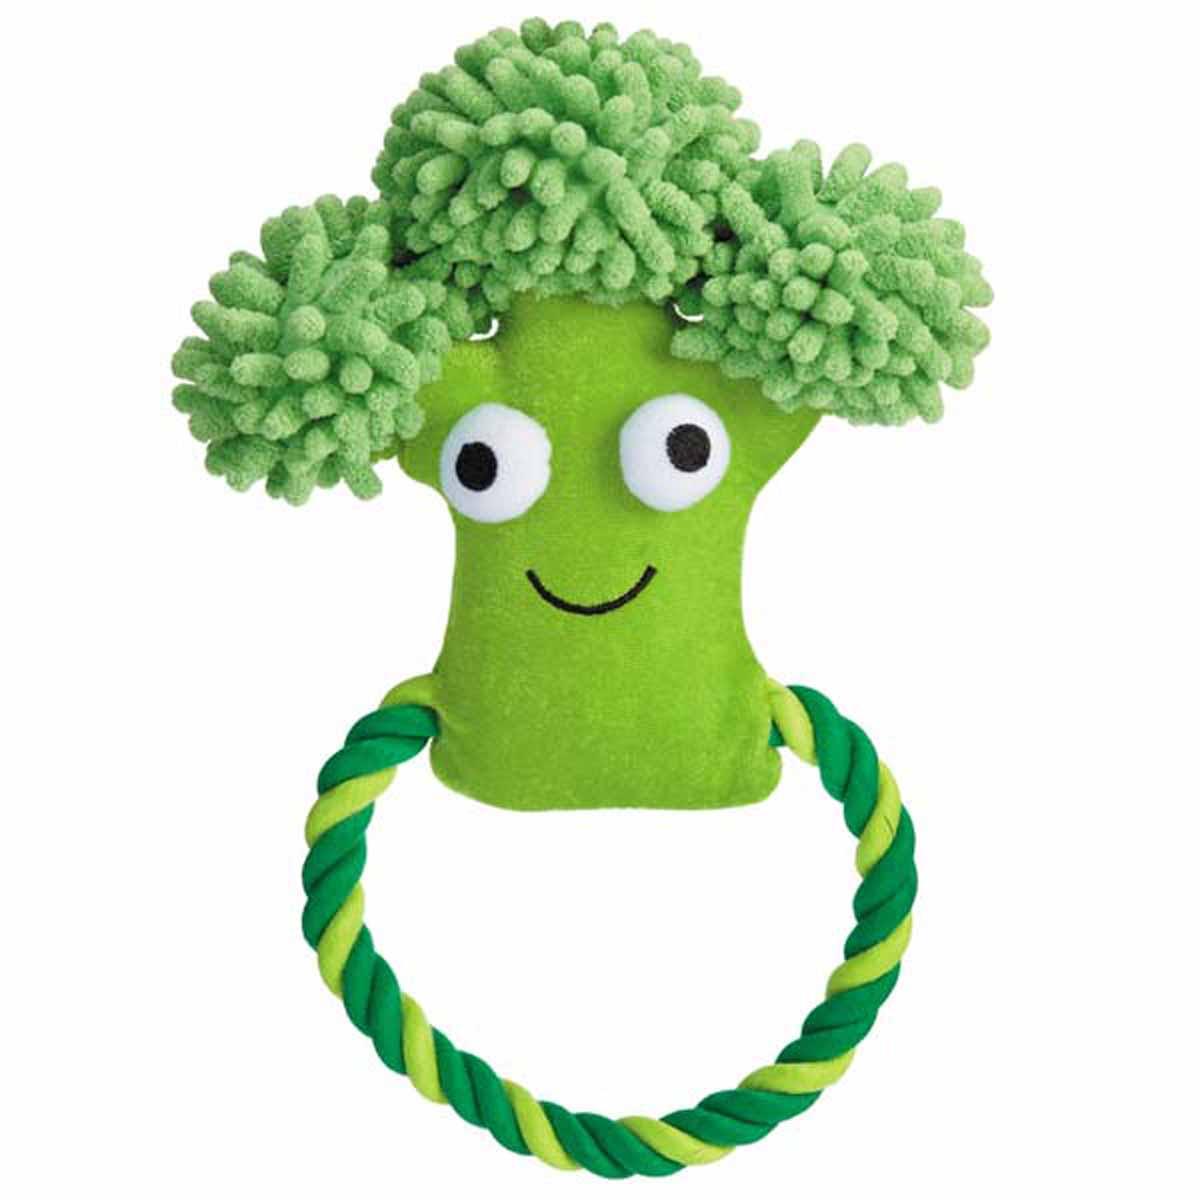 Dog Toy Broccoli